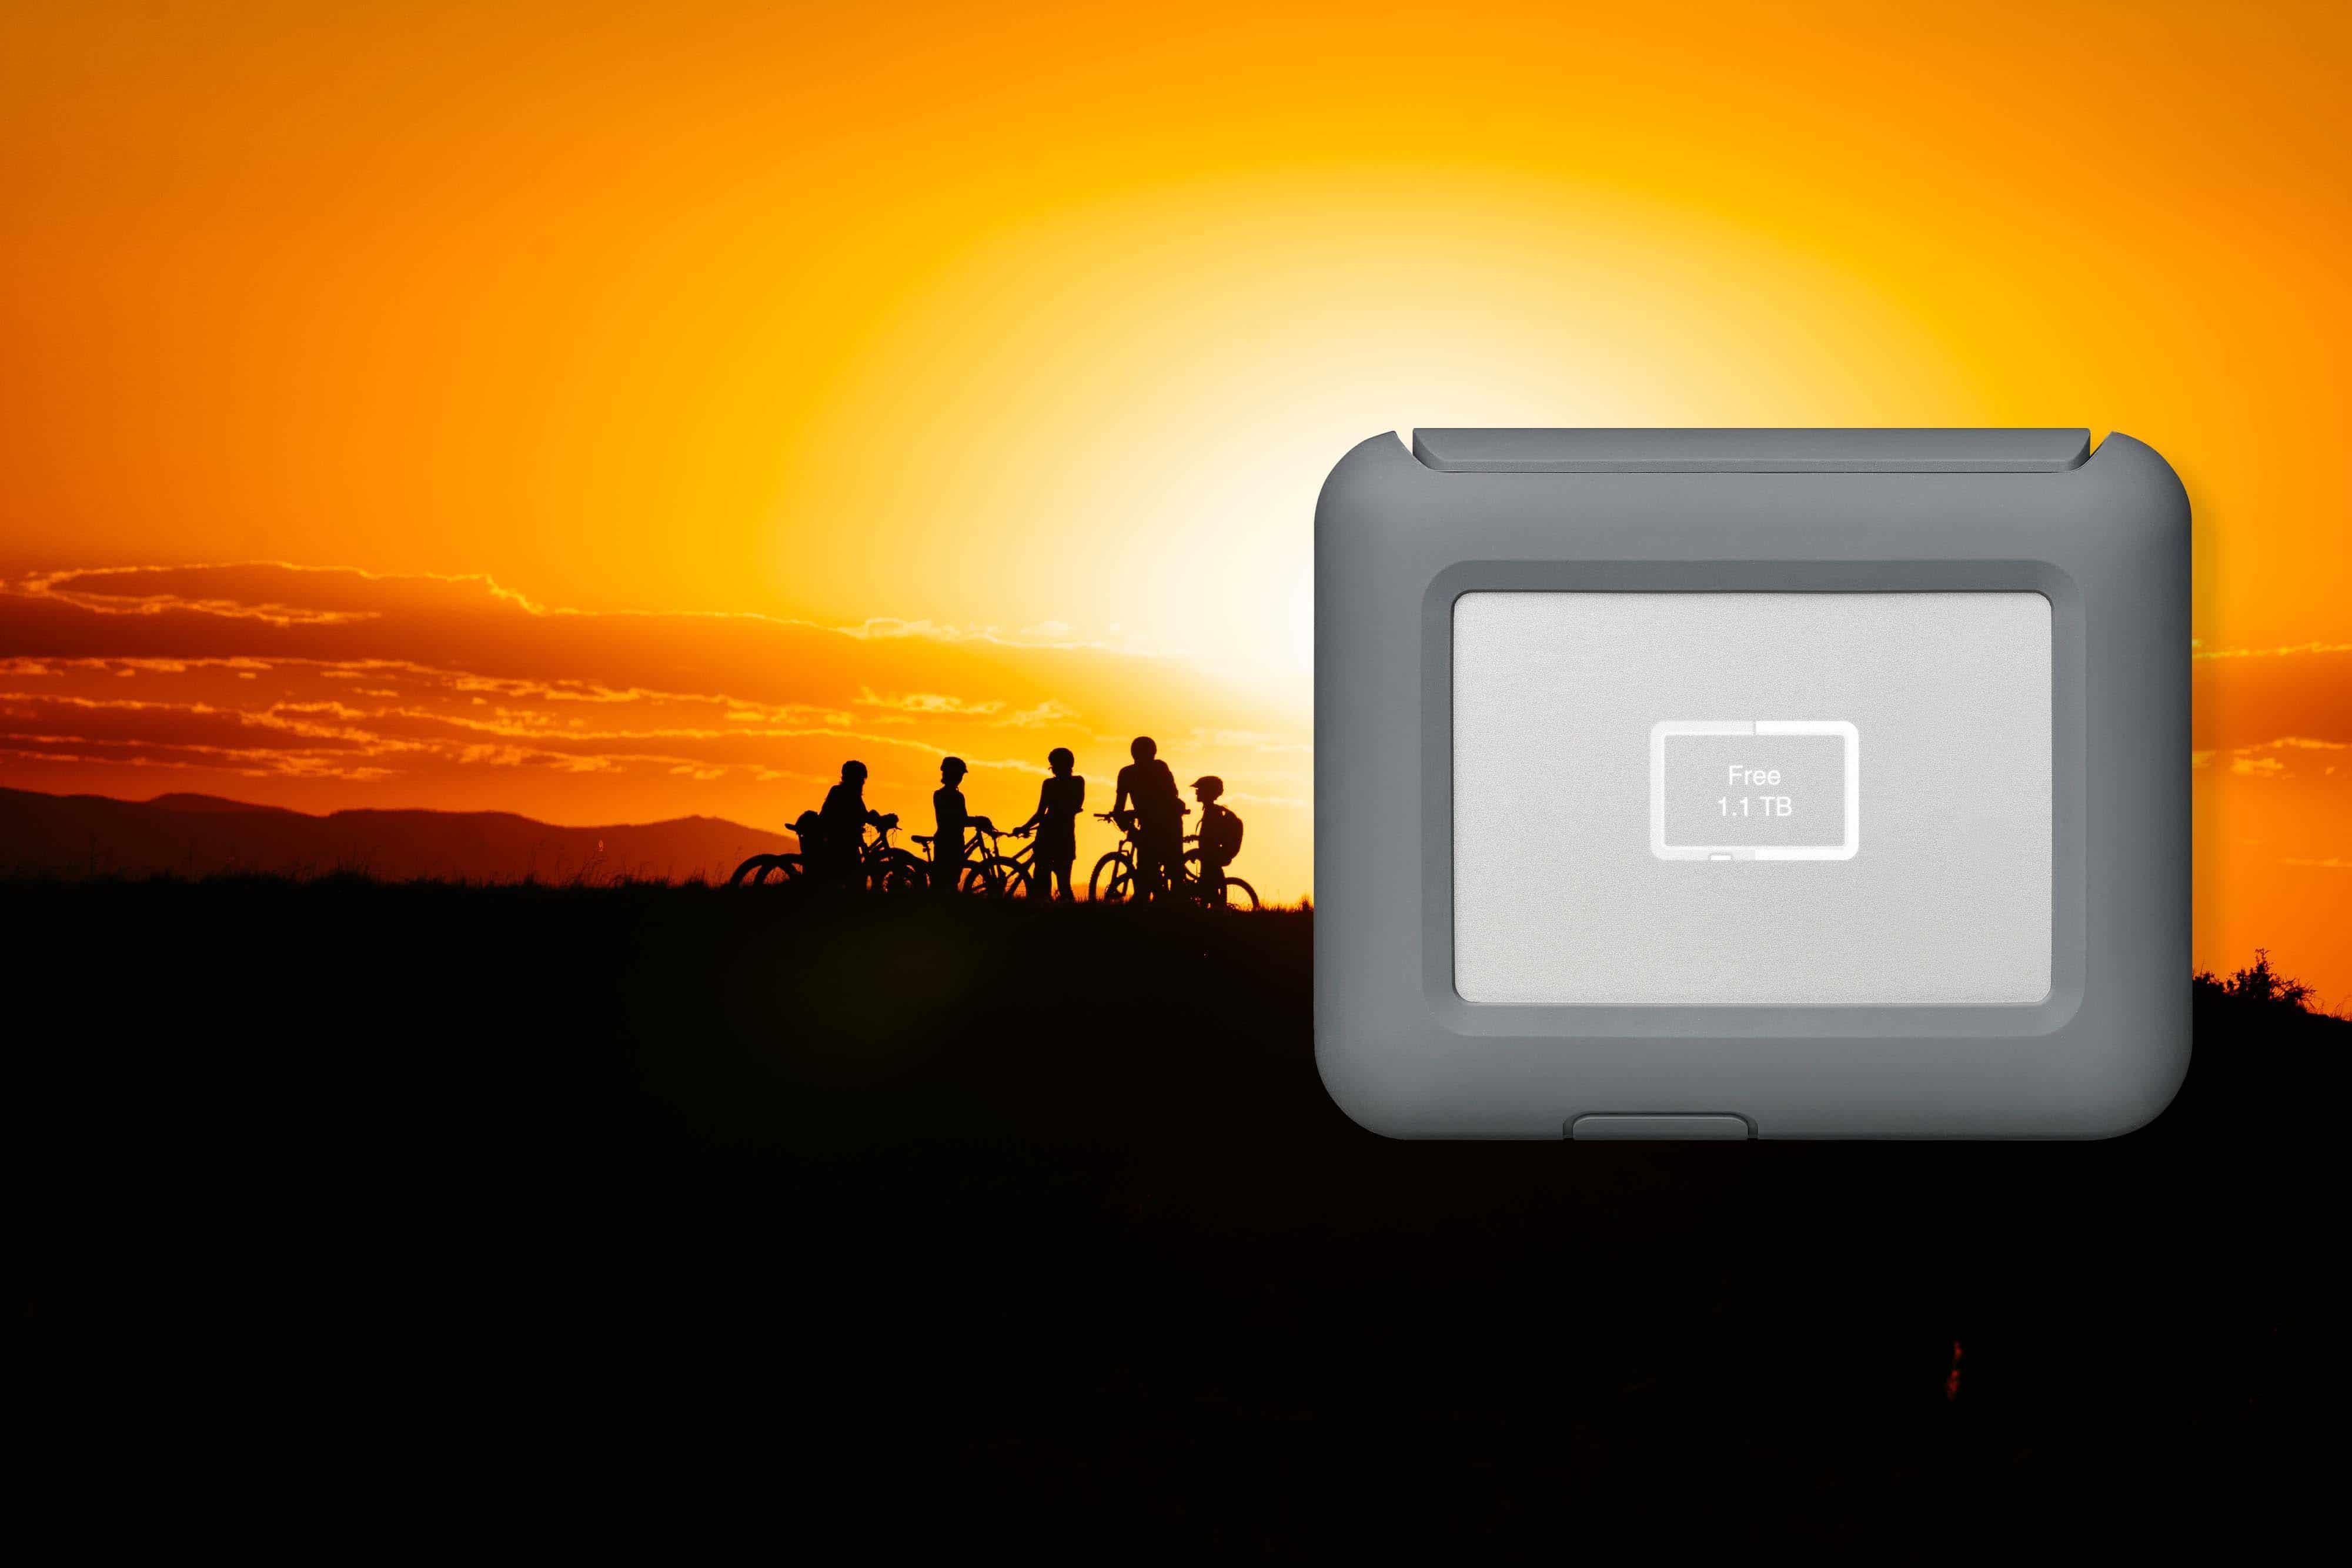 Lacie DJI Copilot BOSS storage header image by Jay Goodrich